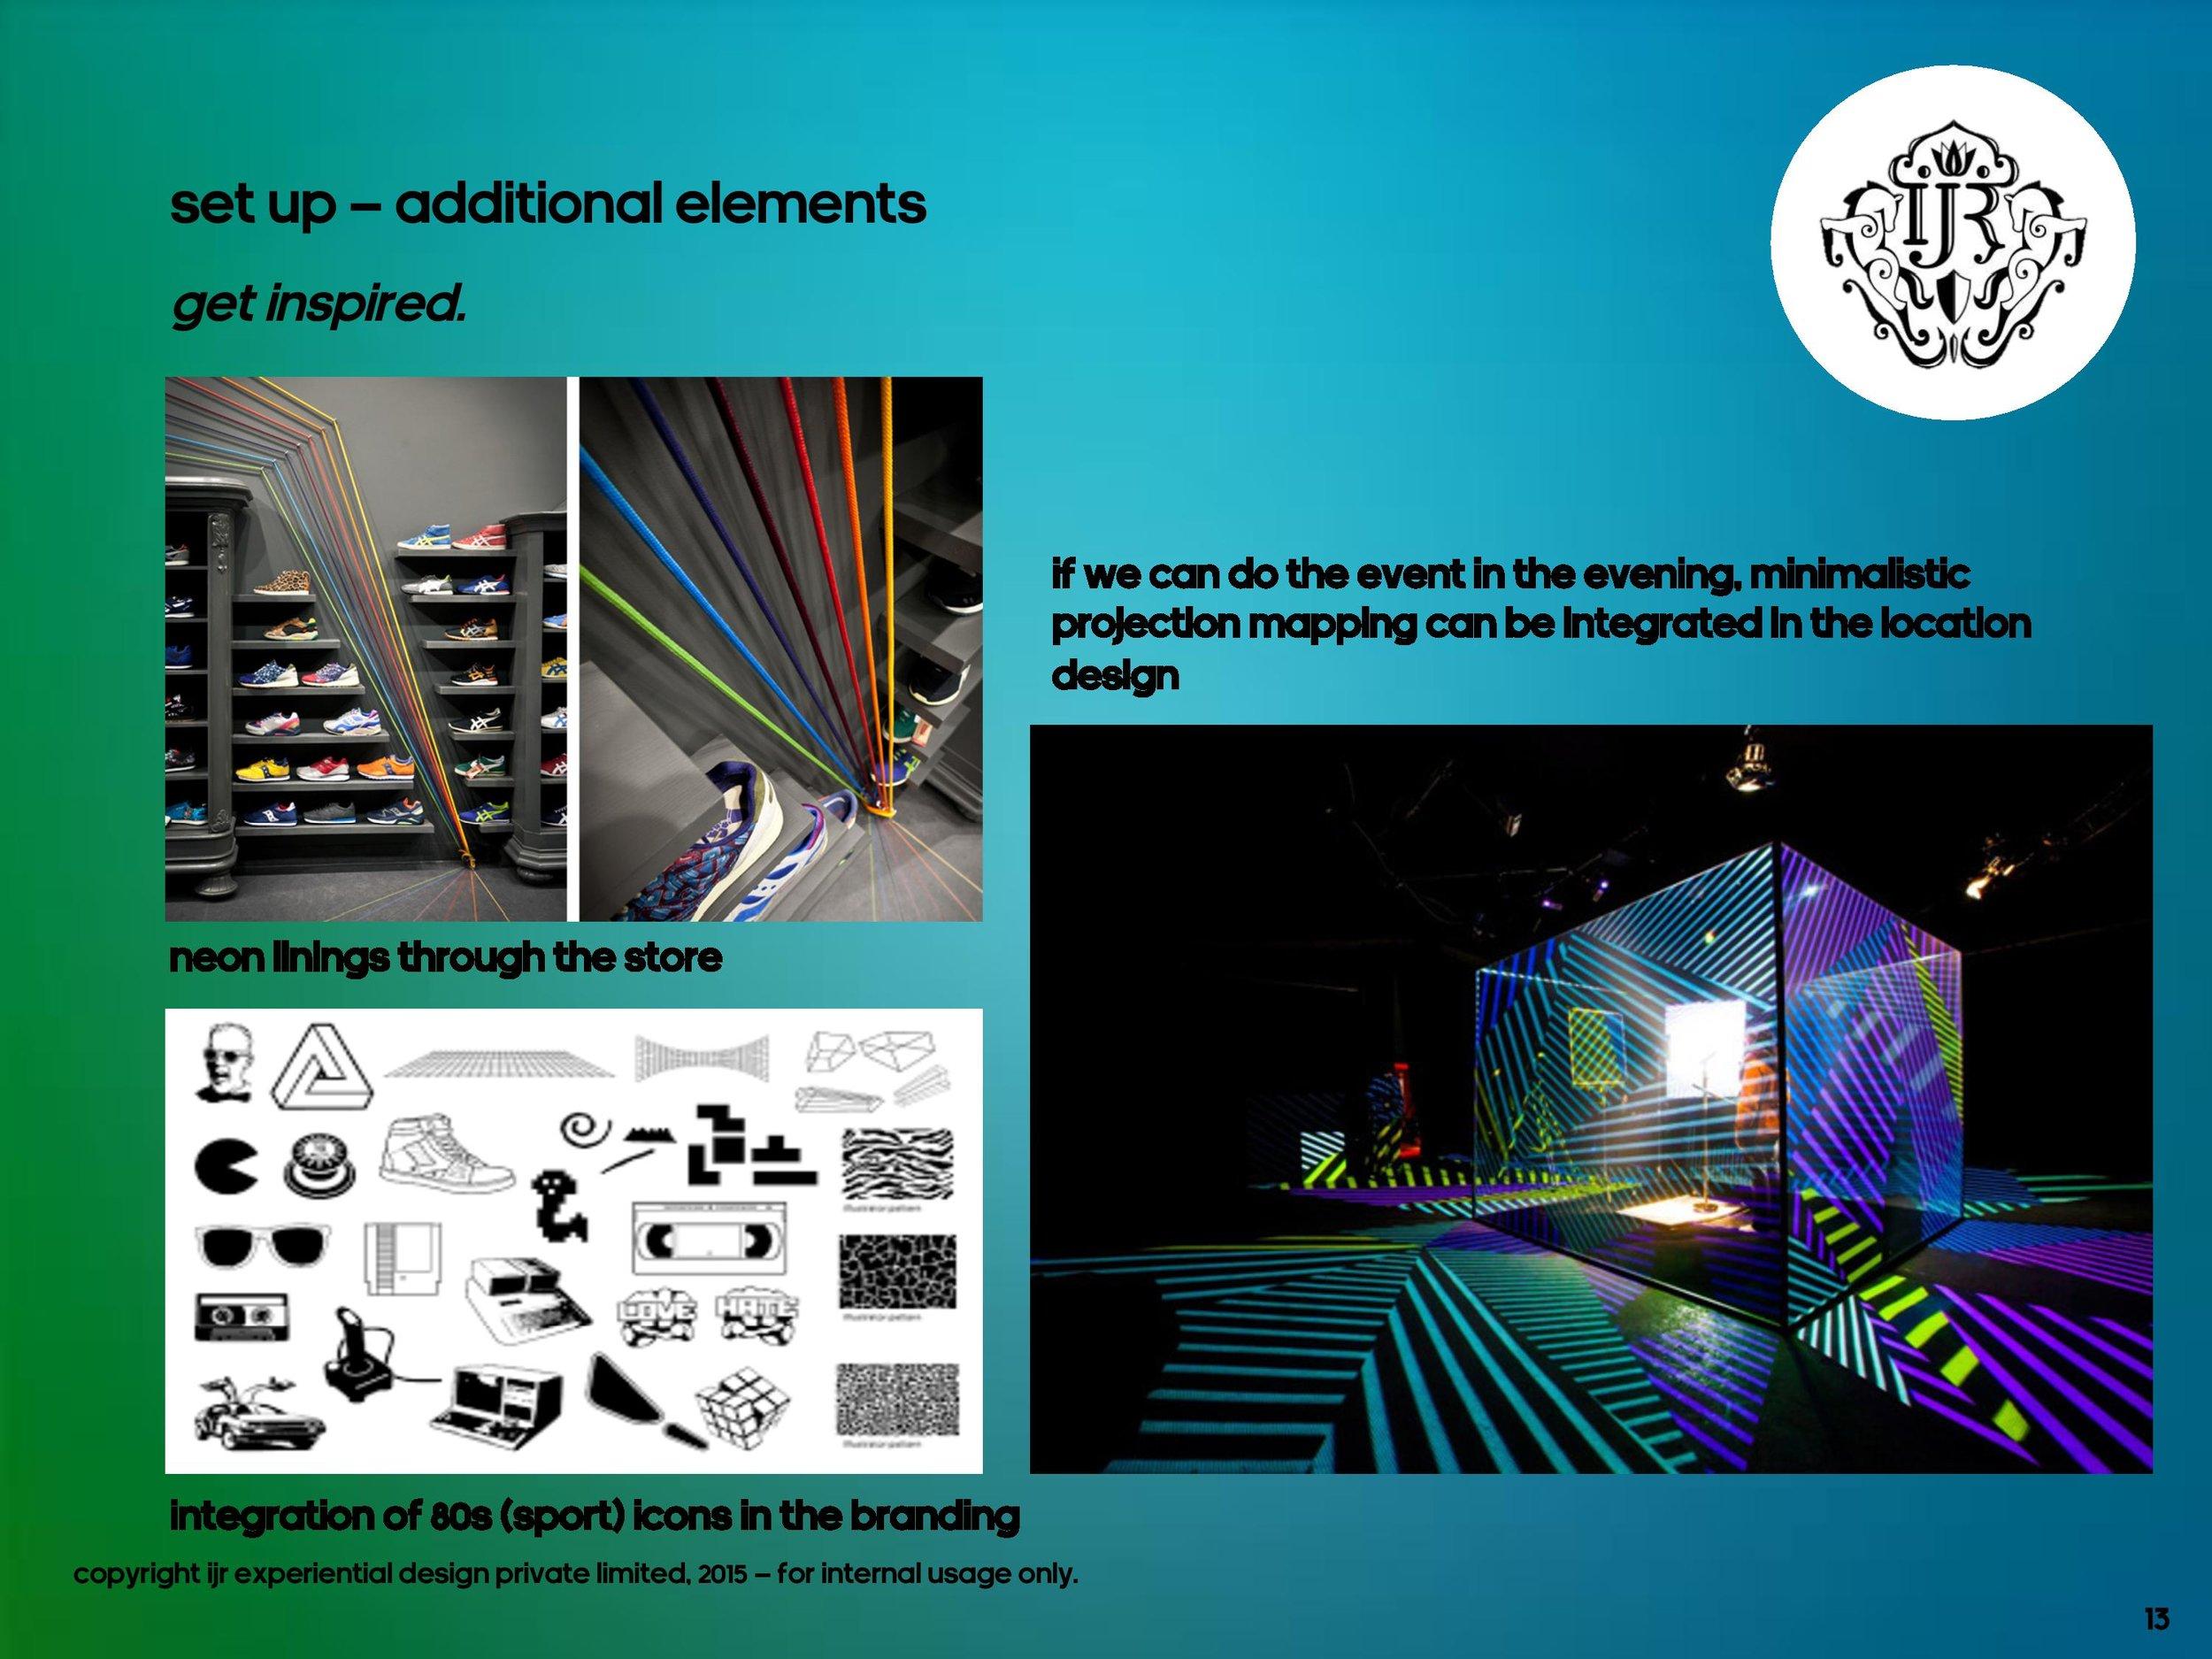 IJR_idea paper_Blogger Event MK-page-013.jpg